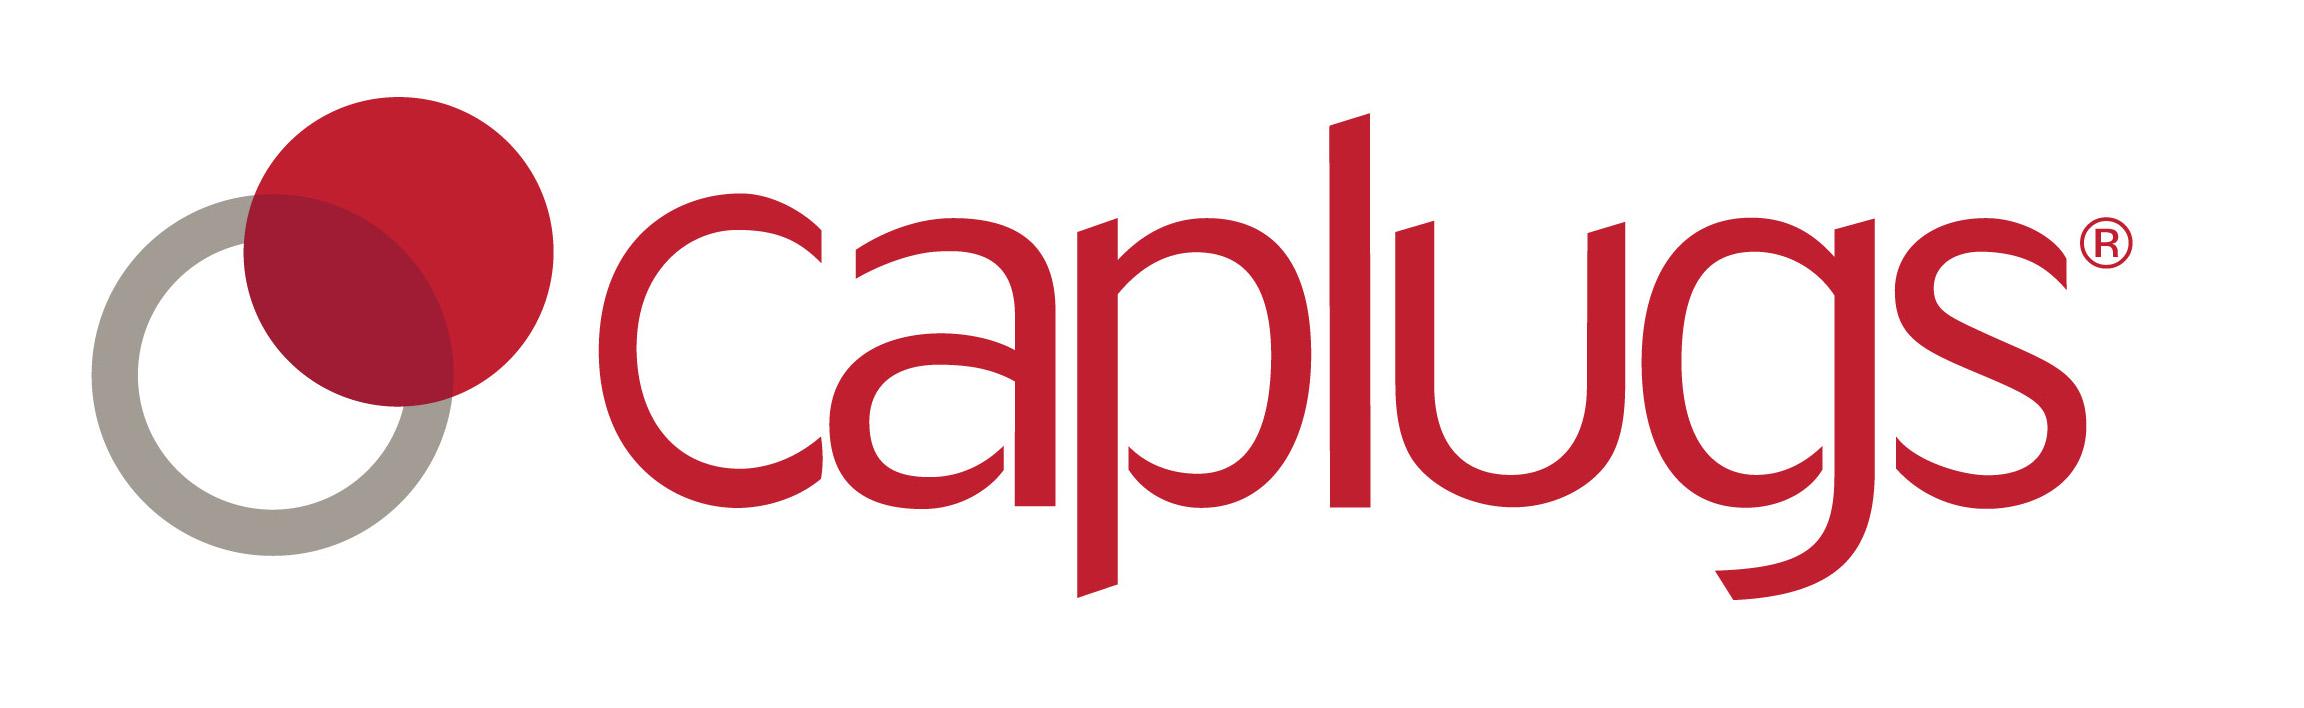 caplugs.jpg